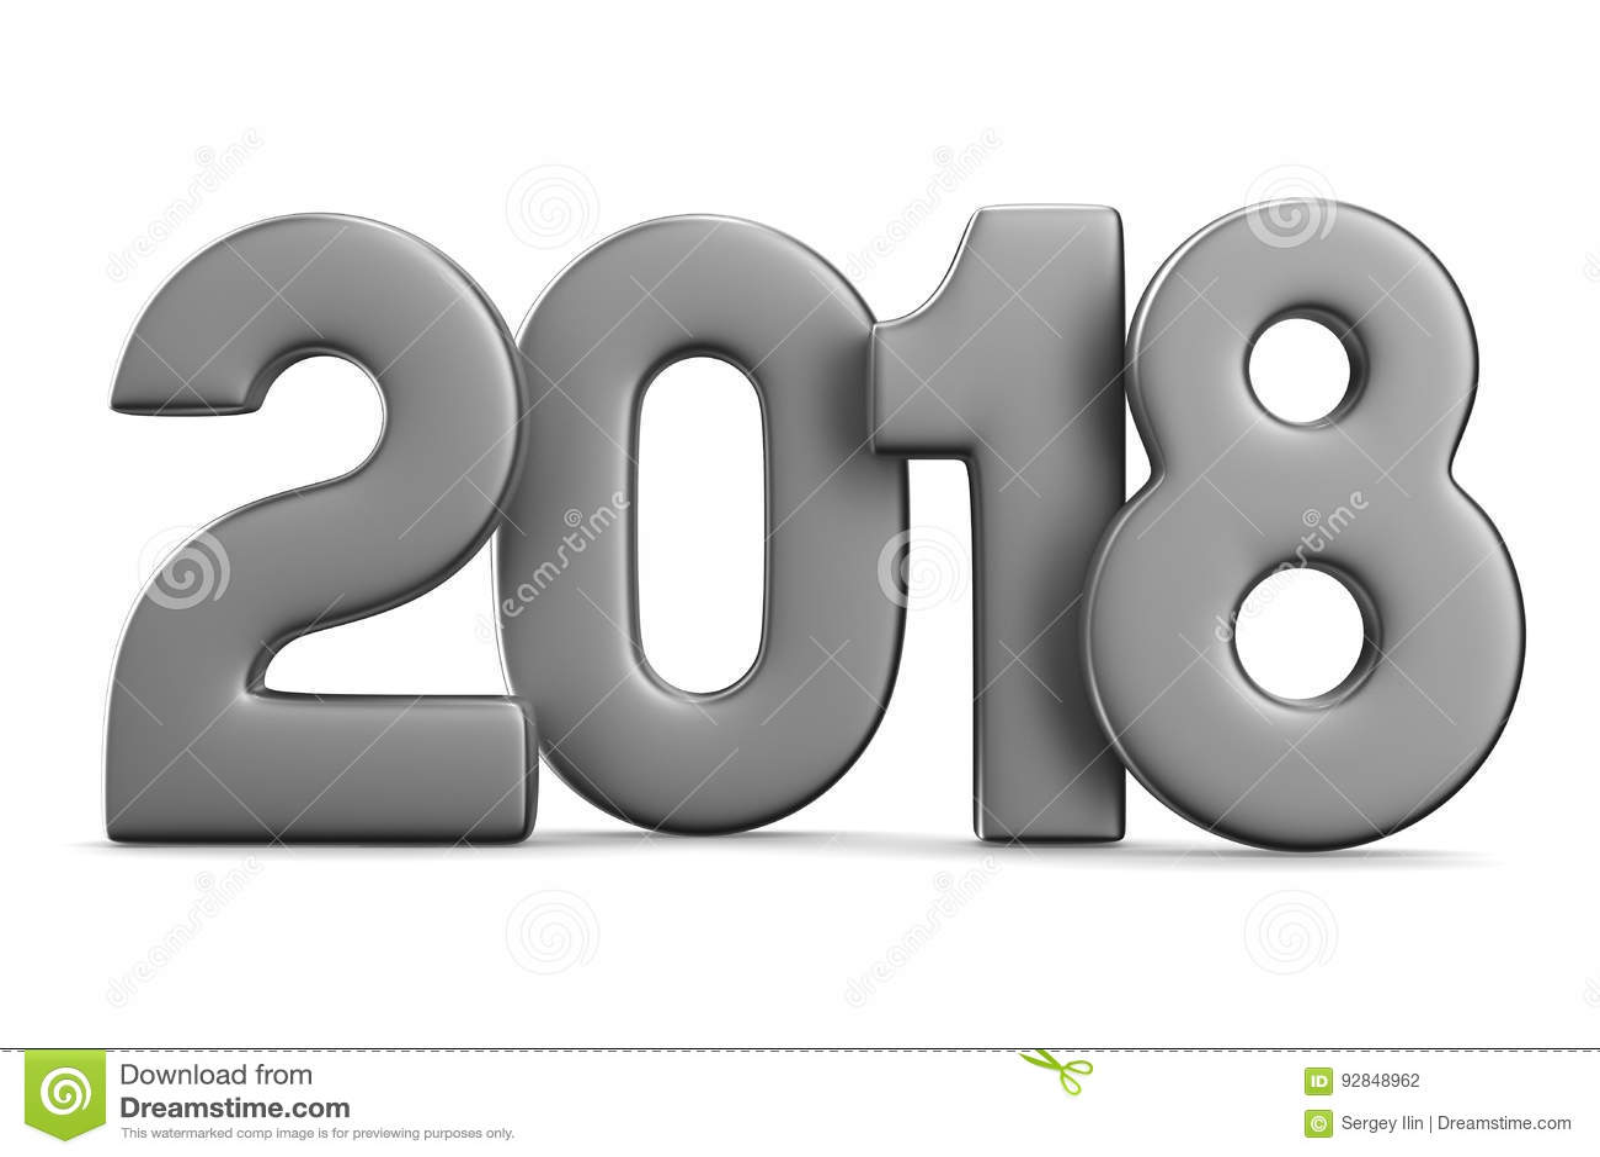 calendar background january 2018